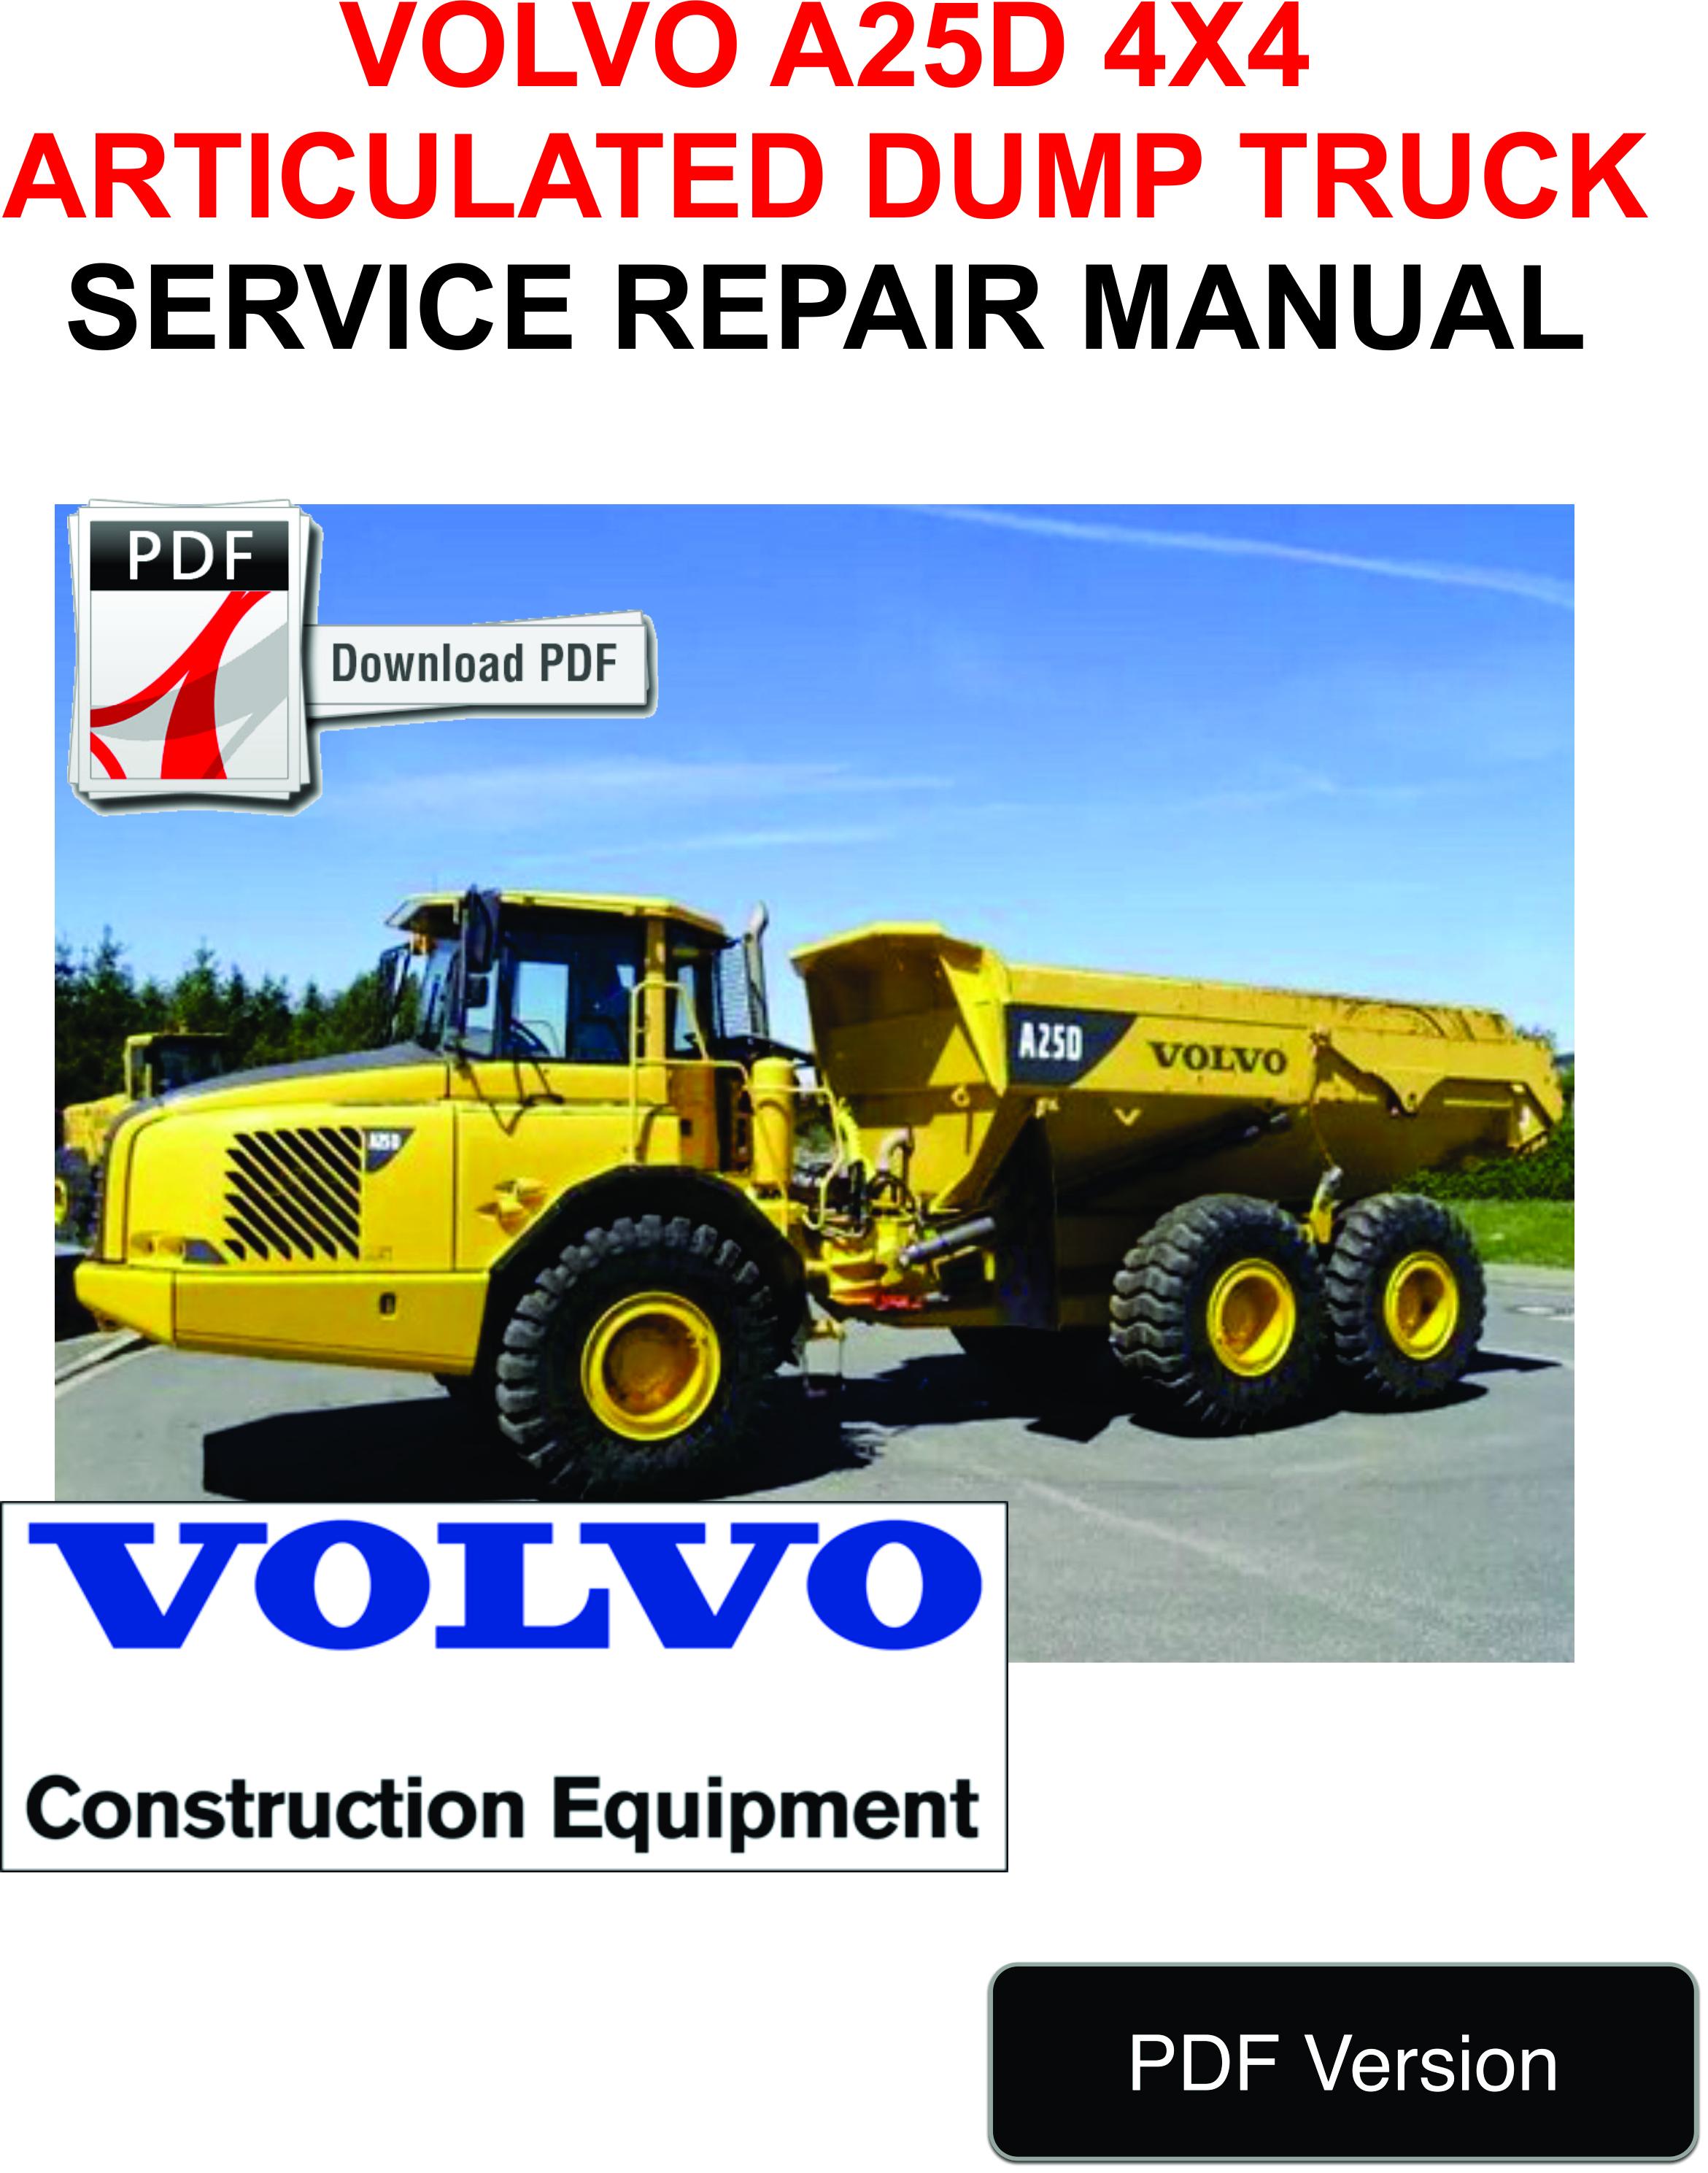 1996 Volvo Semi Truck Wiring Diagram Trusted Diagrams A25 Schematics Diy Enthusiasts U2022 Views